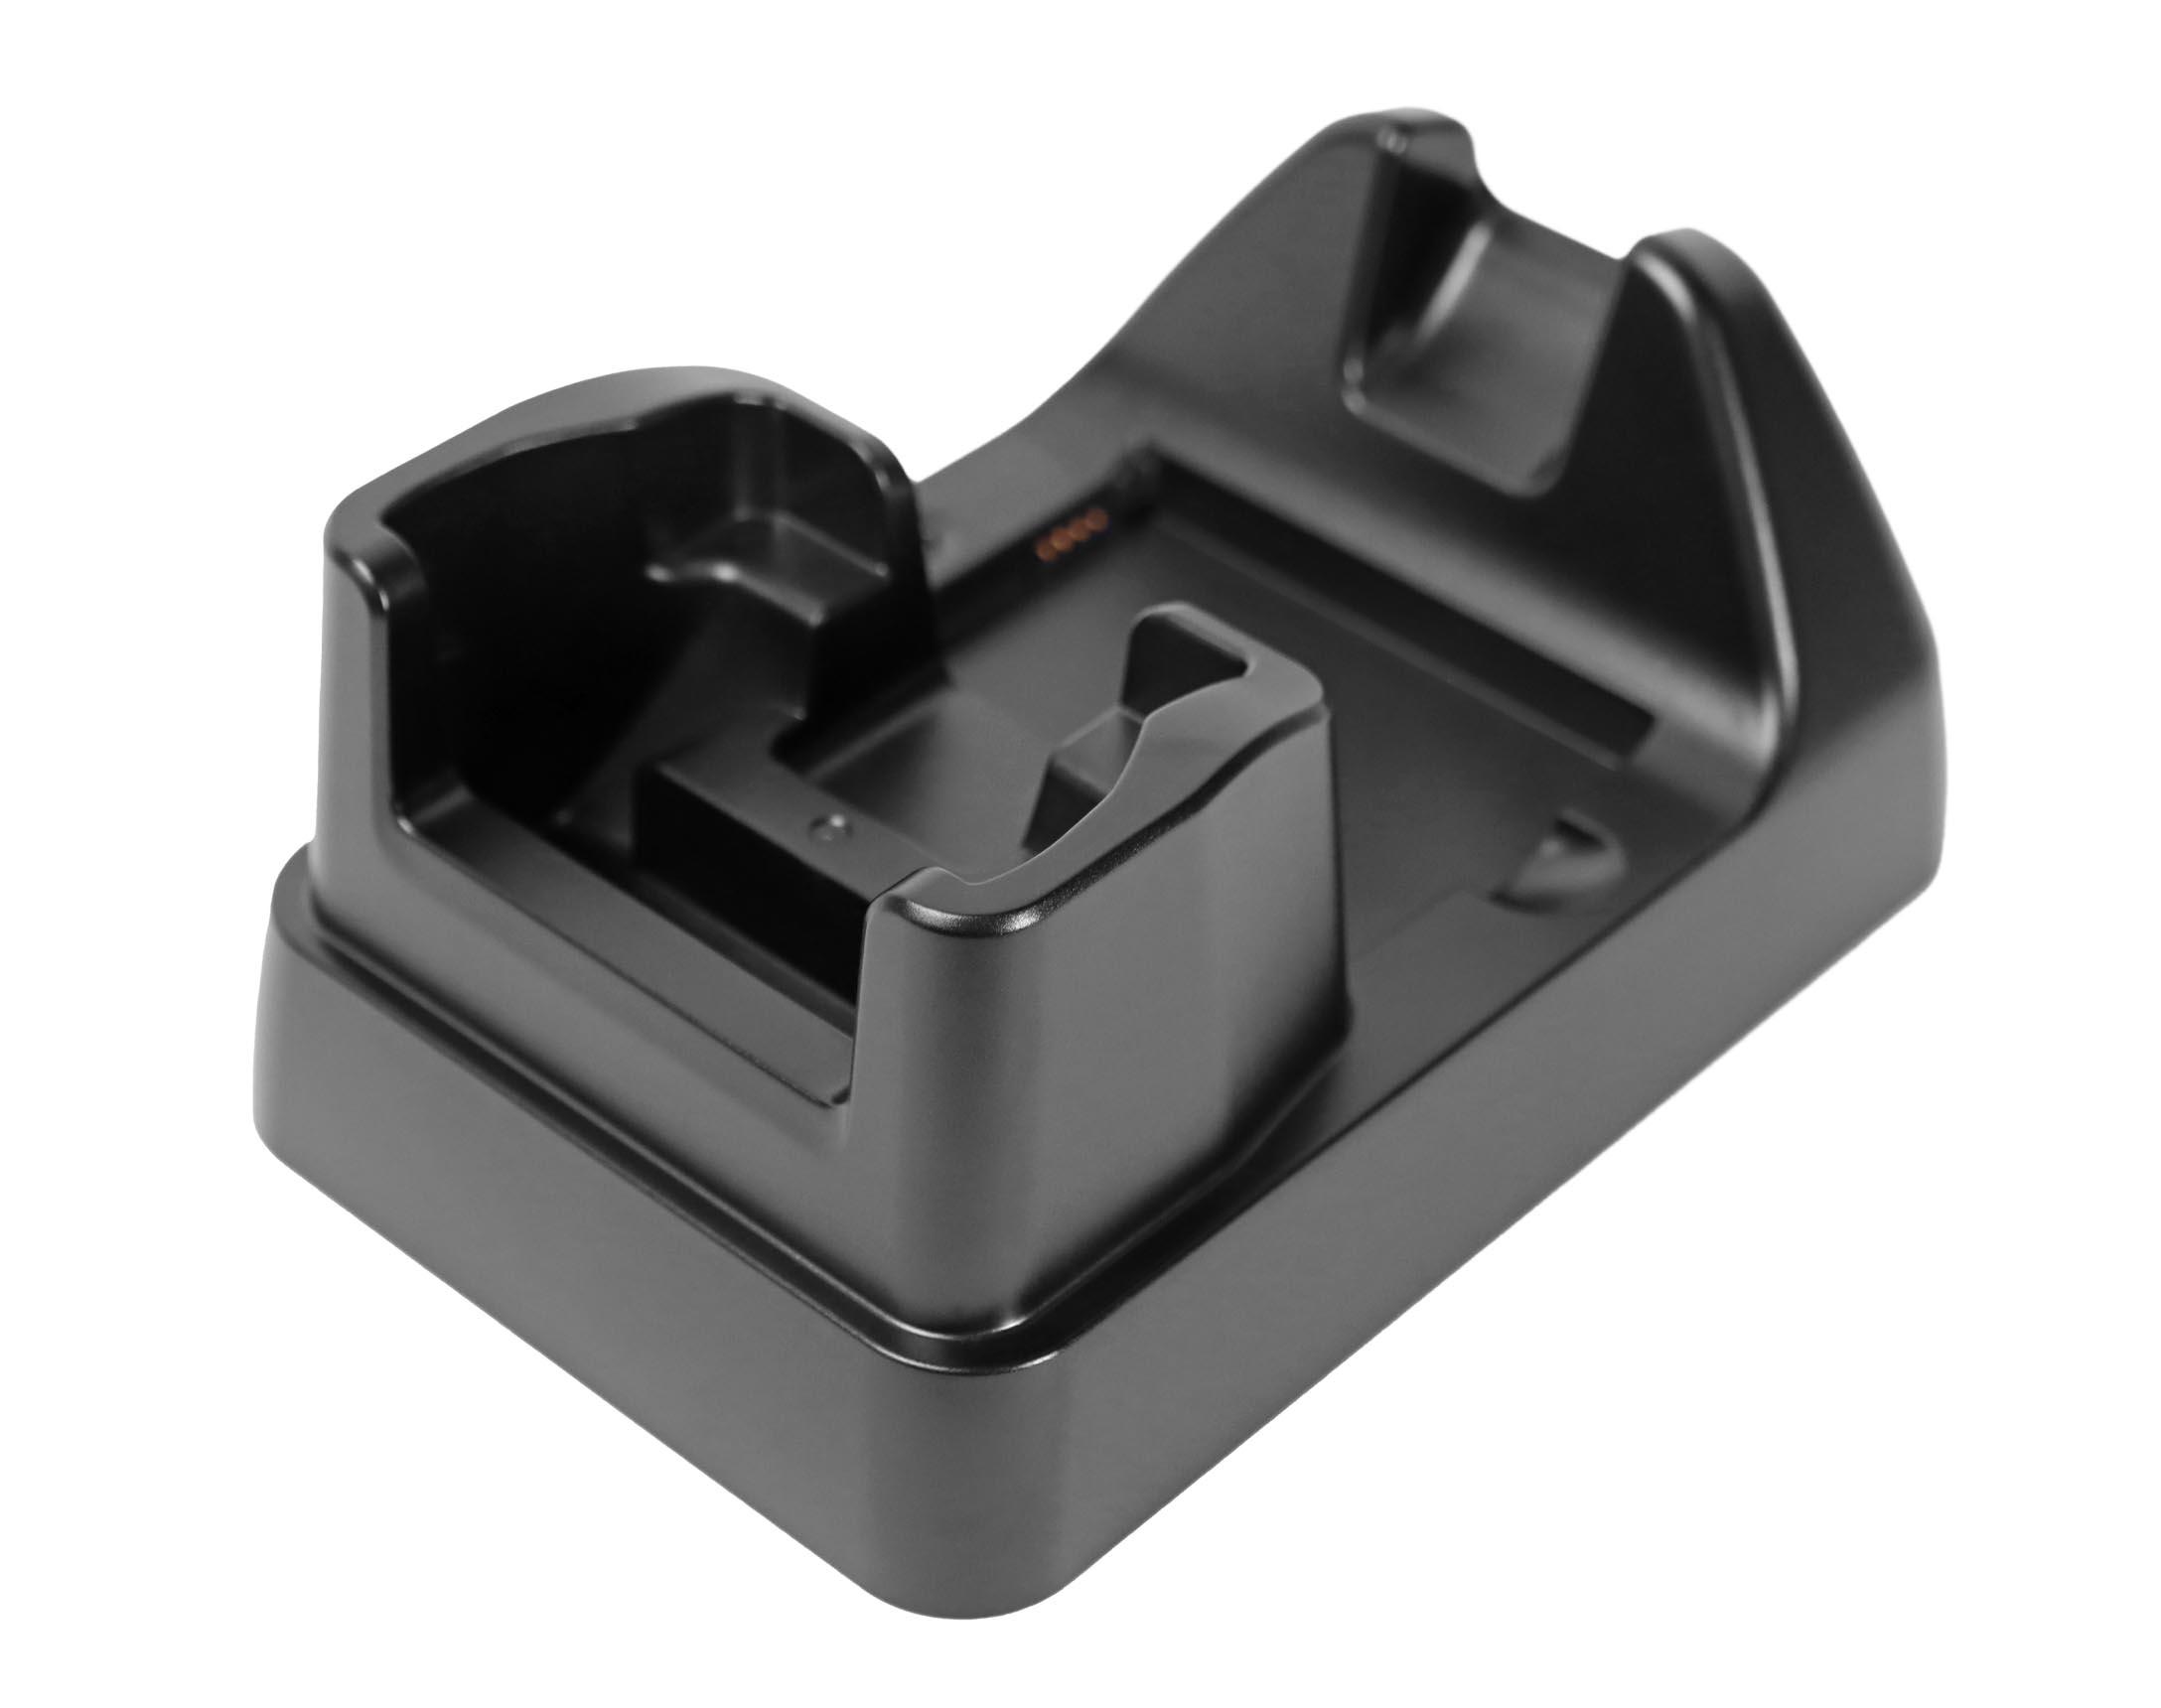 Single Slot Cradle for Pistol Grip / RF750